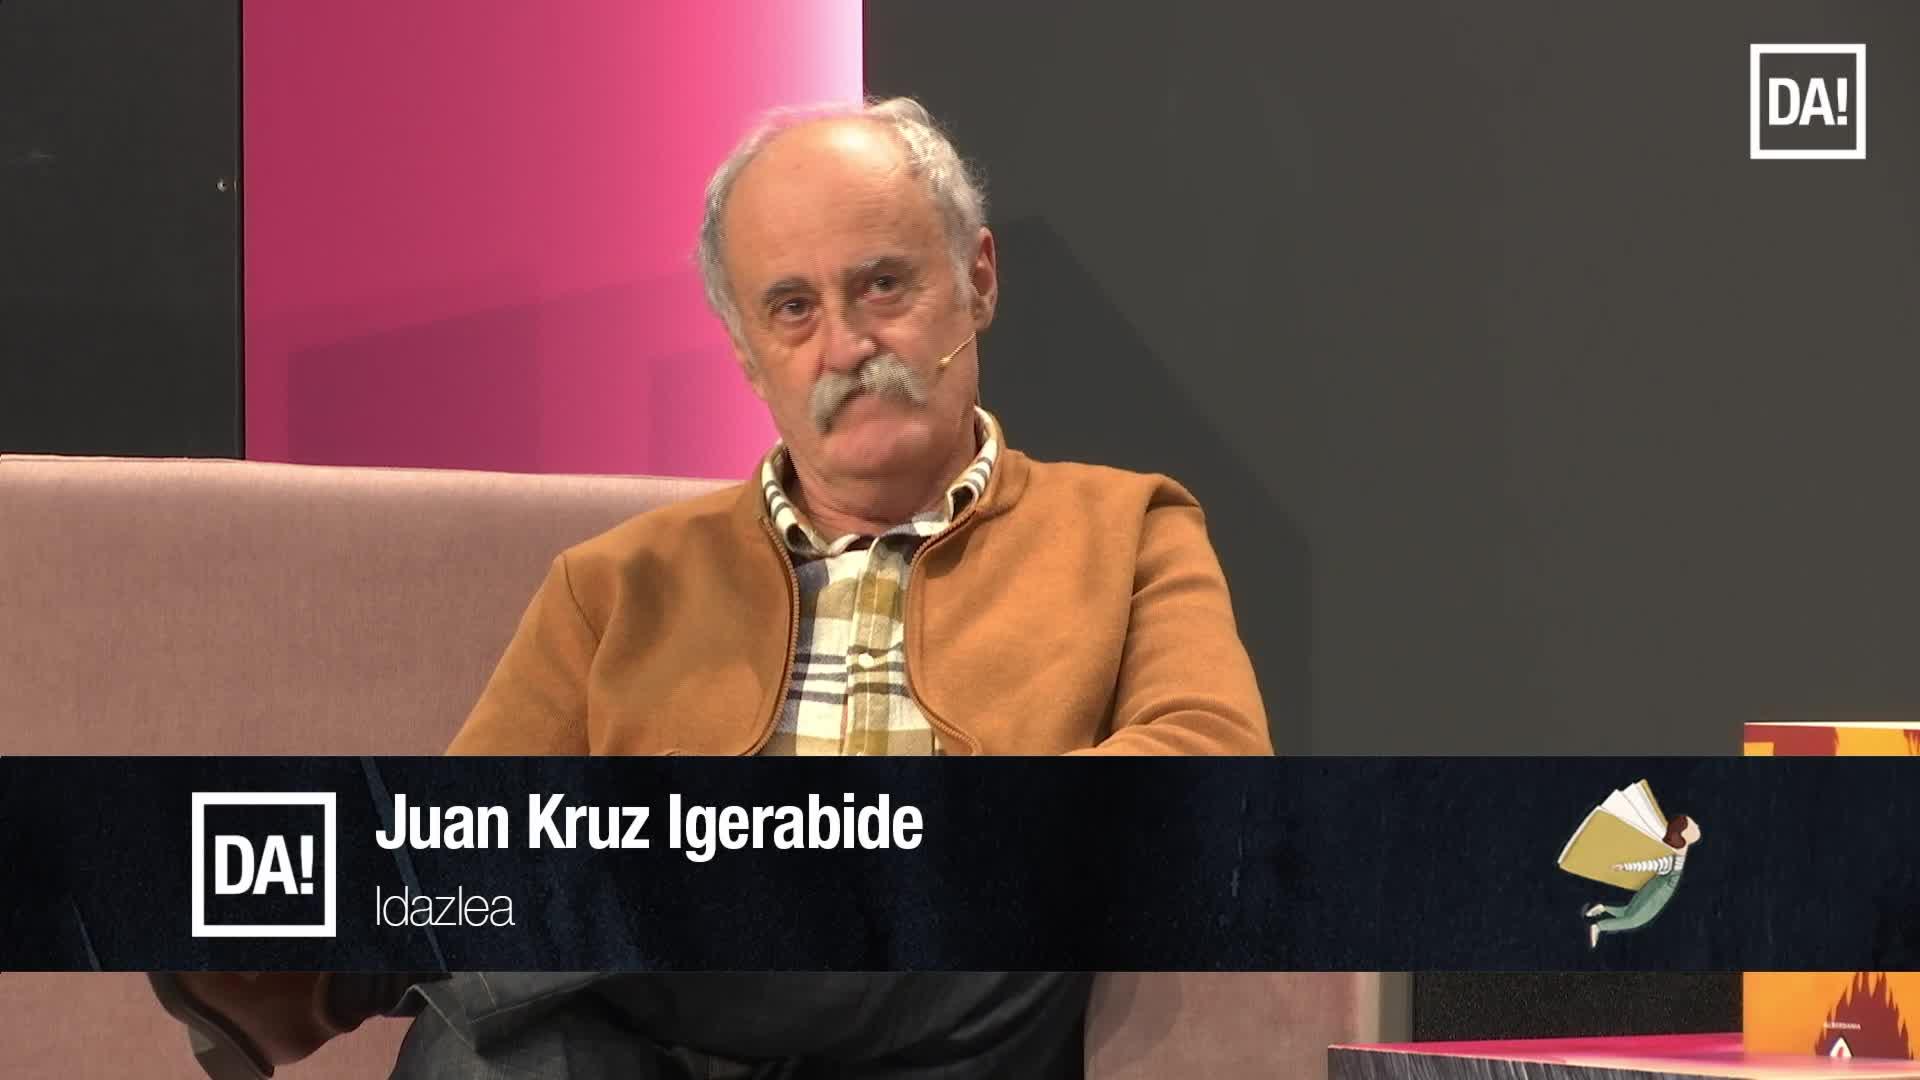 Juan Kruz Igerabide